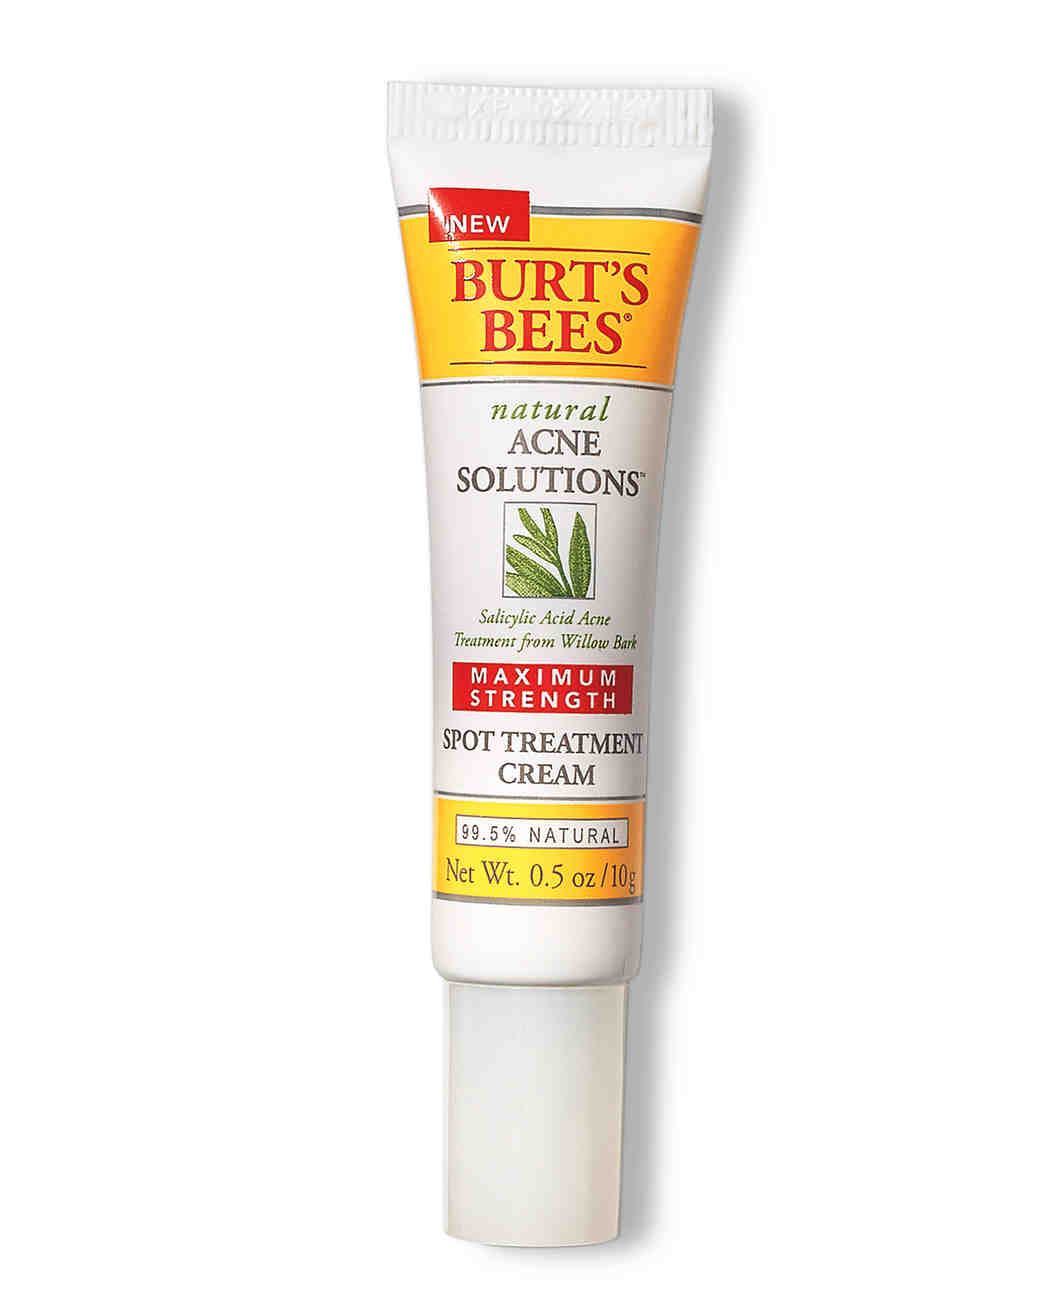 burts-bees-acne-255-d111715.jpg